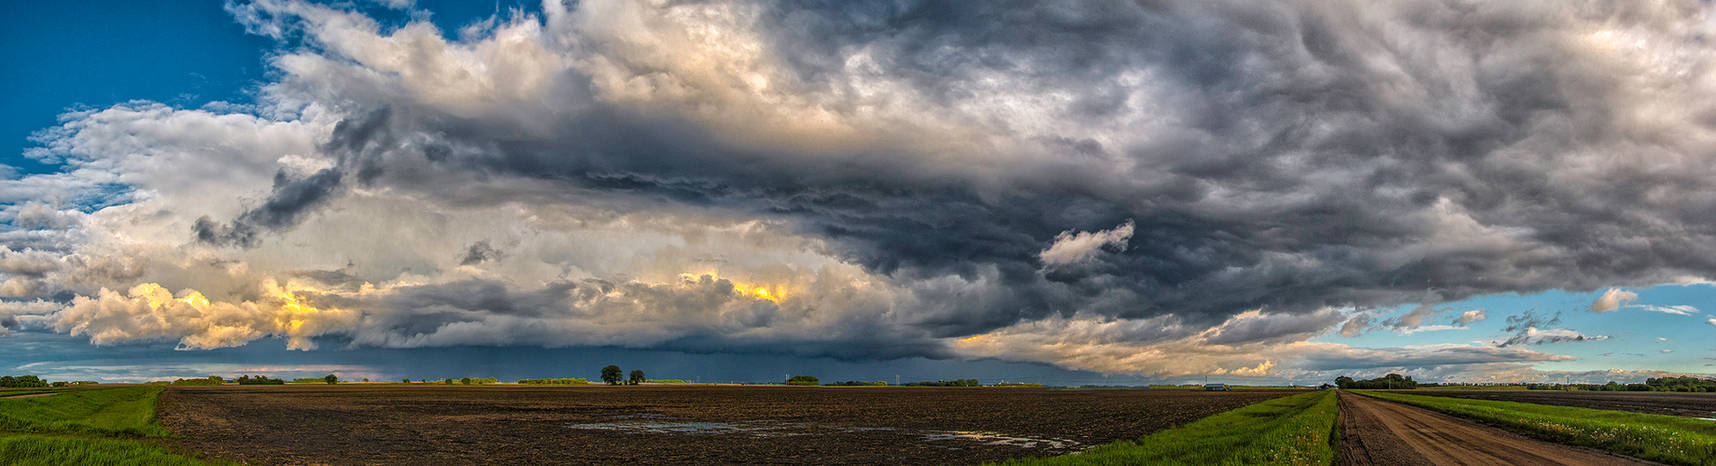 Midwest Landscape I